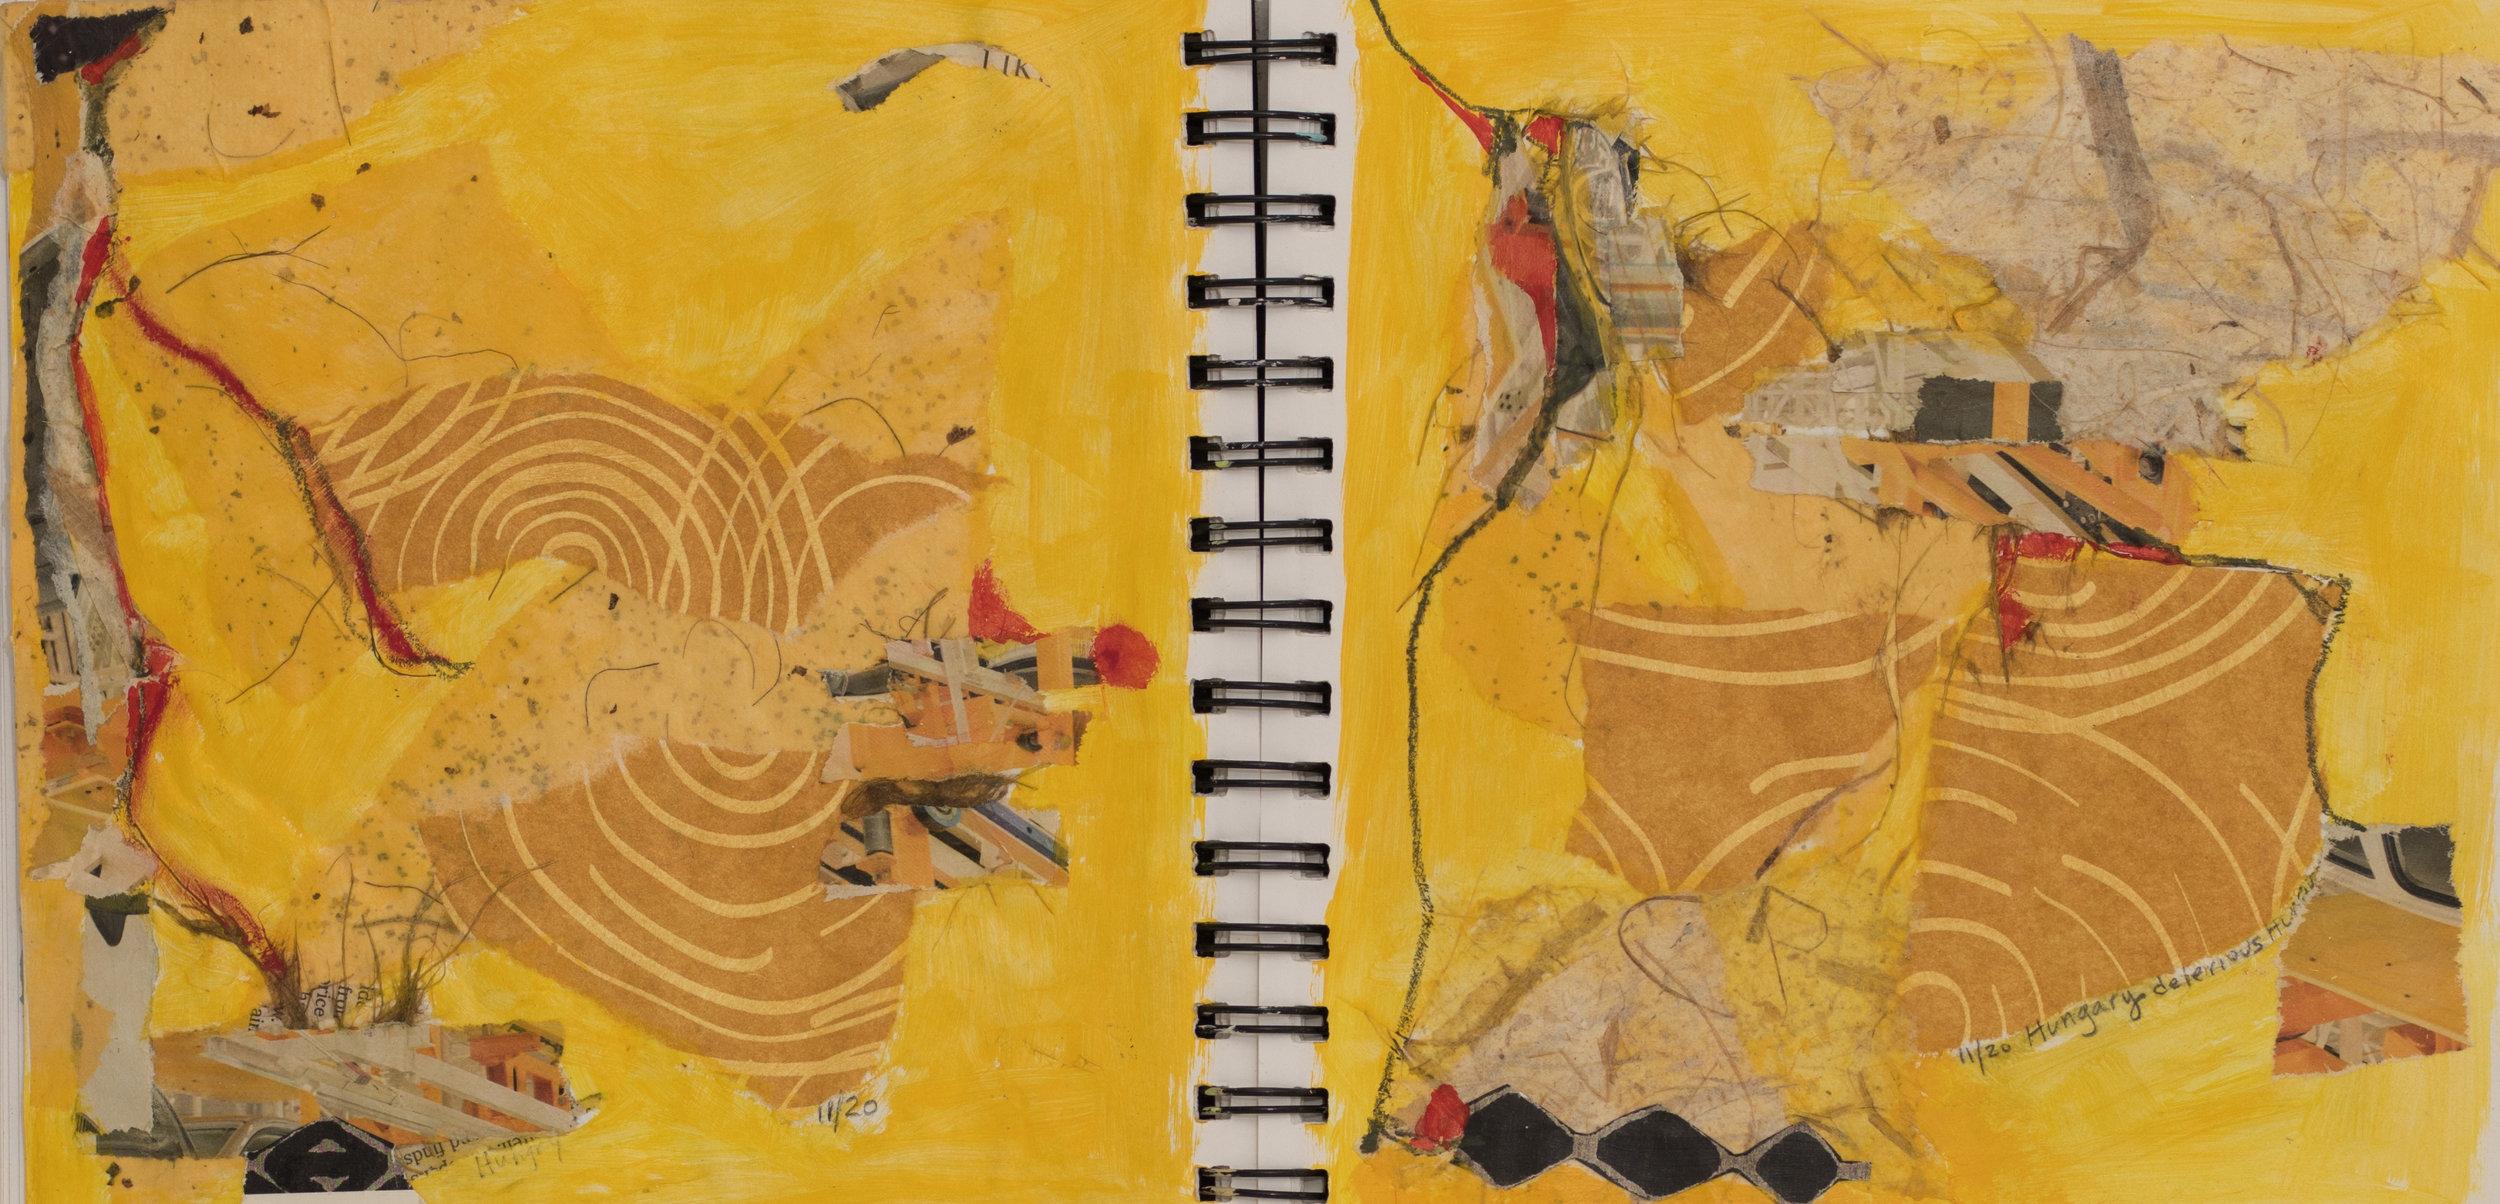 Delirium   Mixed Media on Paper  7 x 14 inches